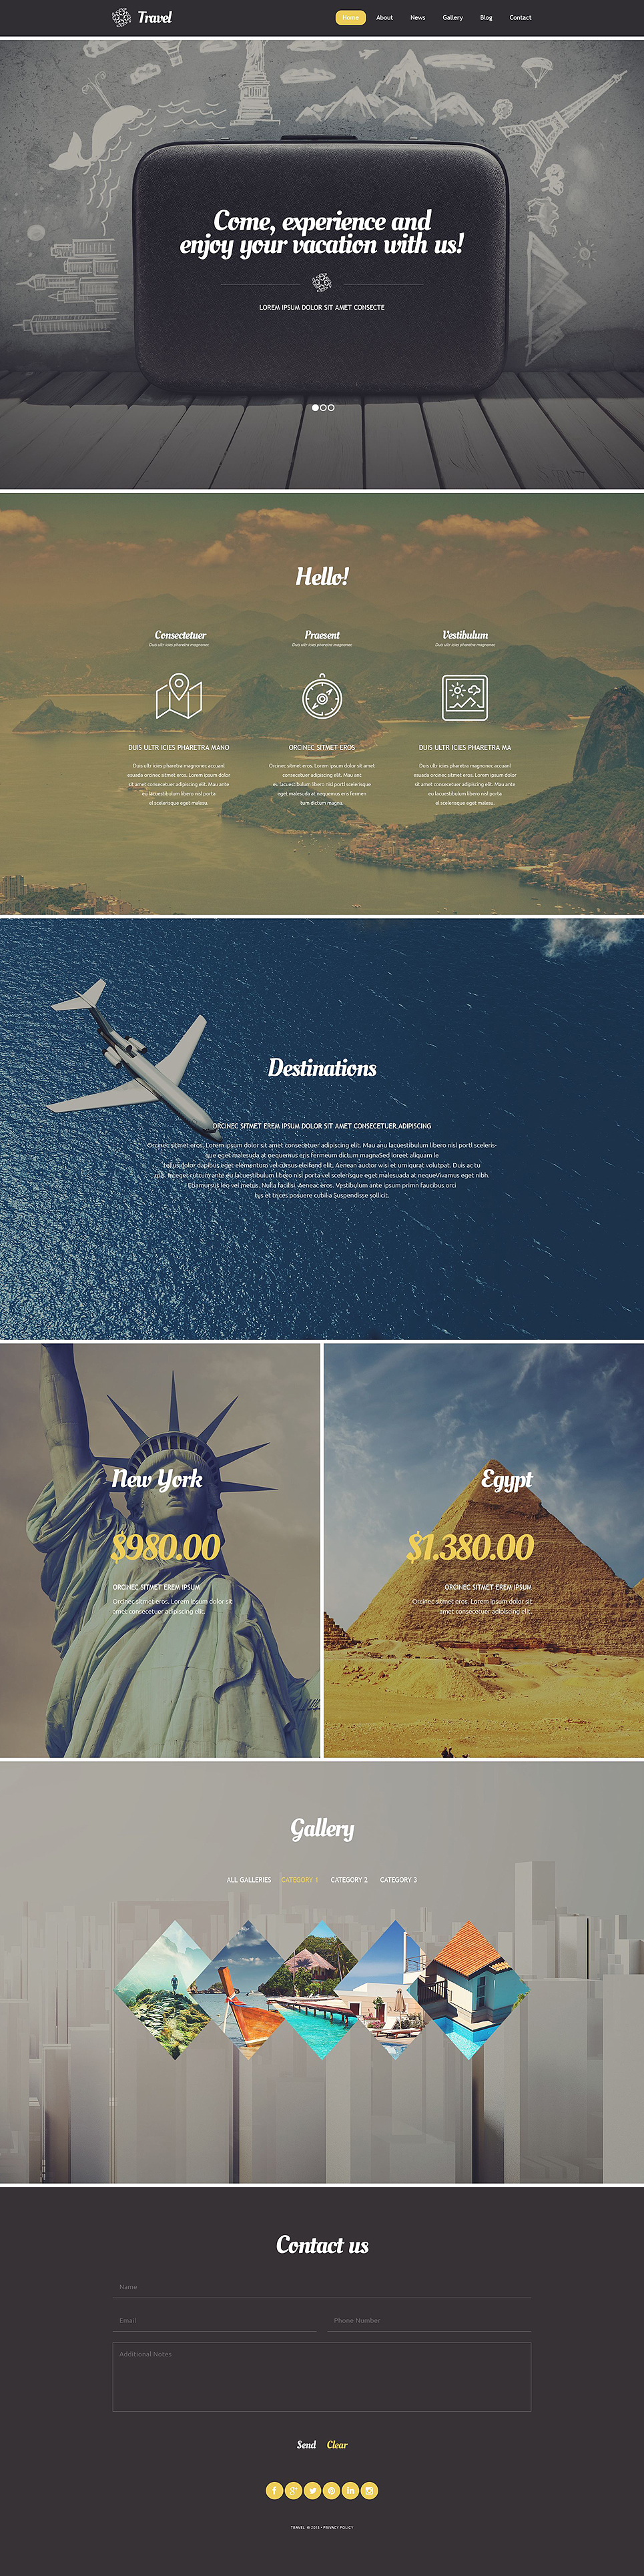 Адаптивный шаблон сайта на тему агентство путешествий #54580